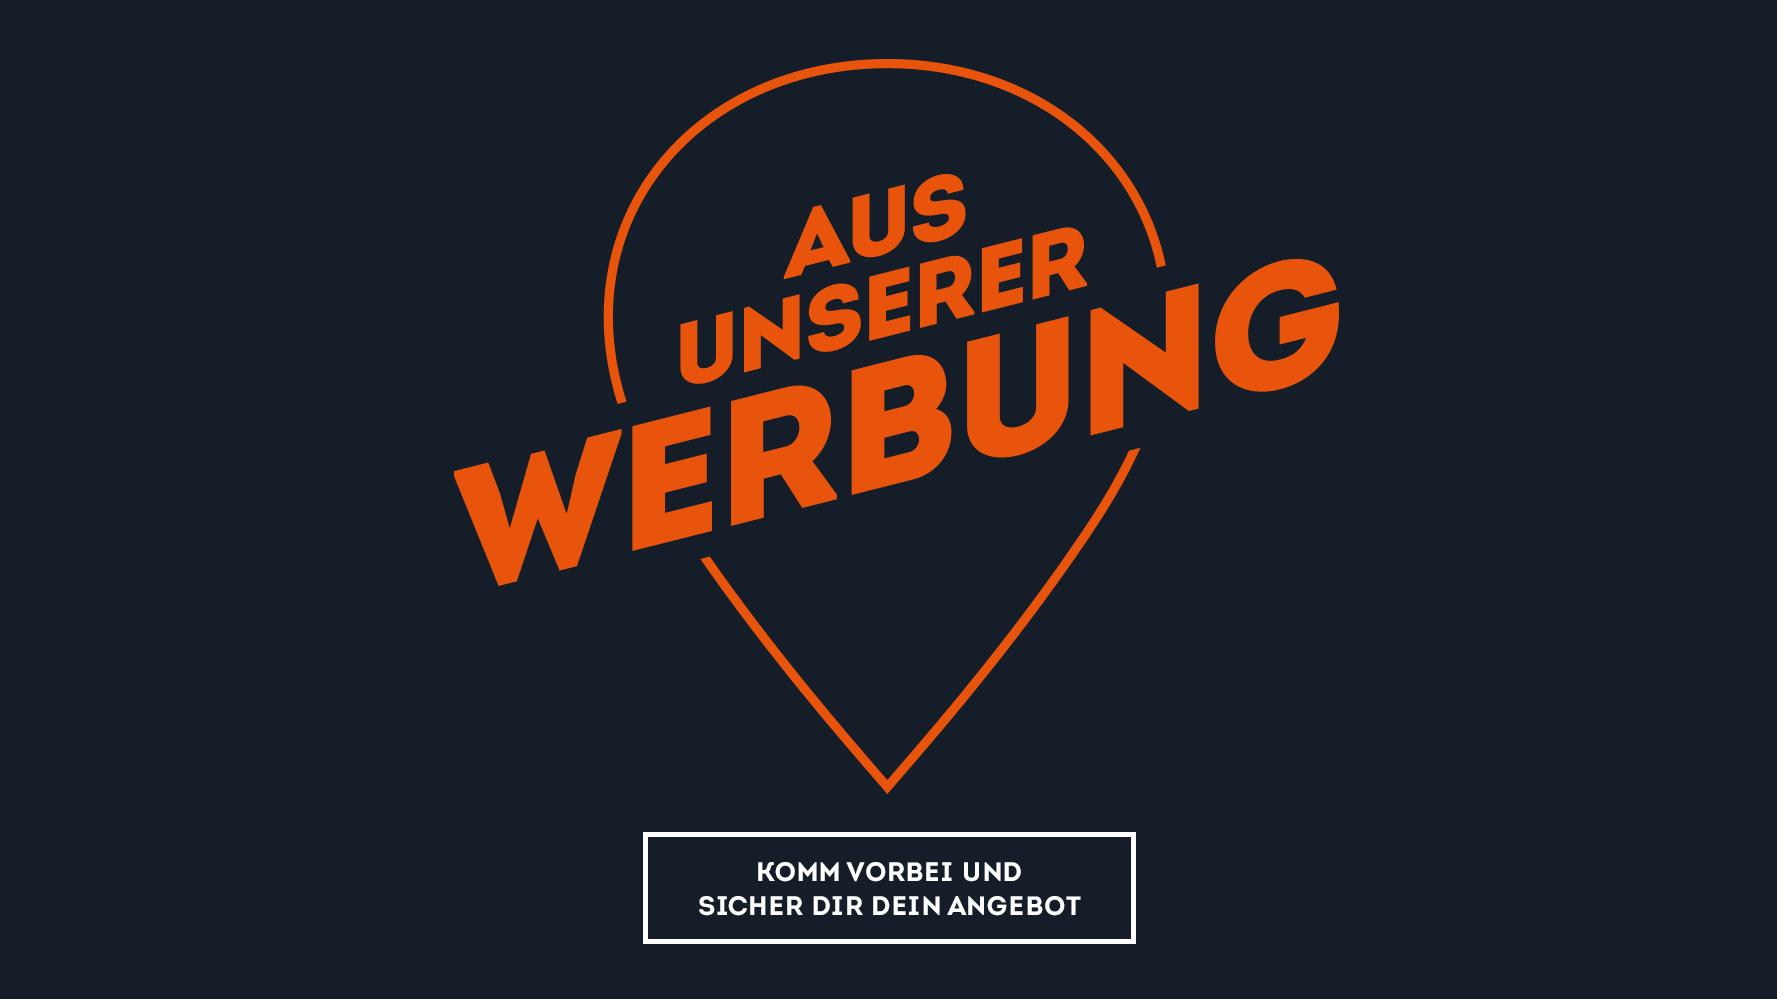 SportScheck Magdeburg, Ernst-Reuter-Allee in Magdeburg